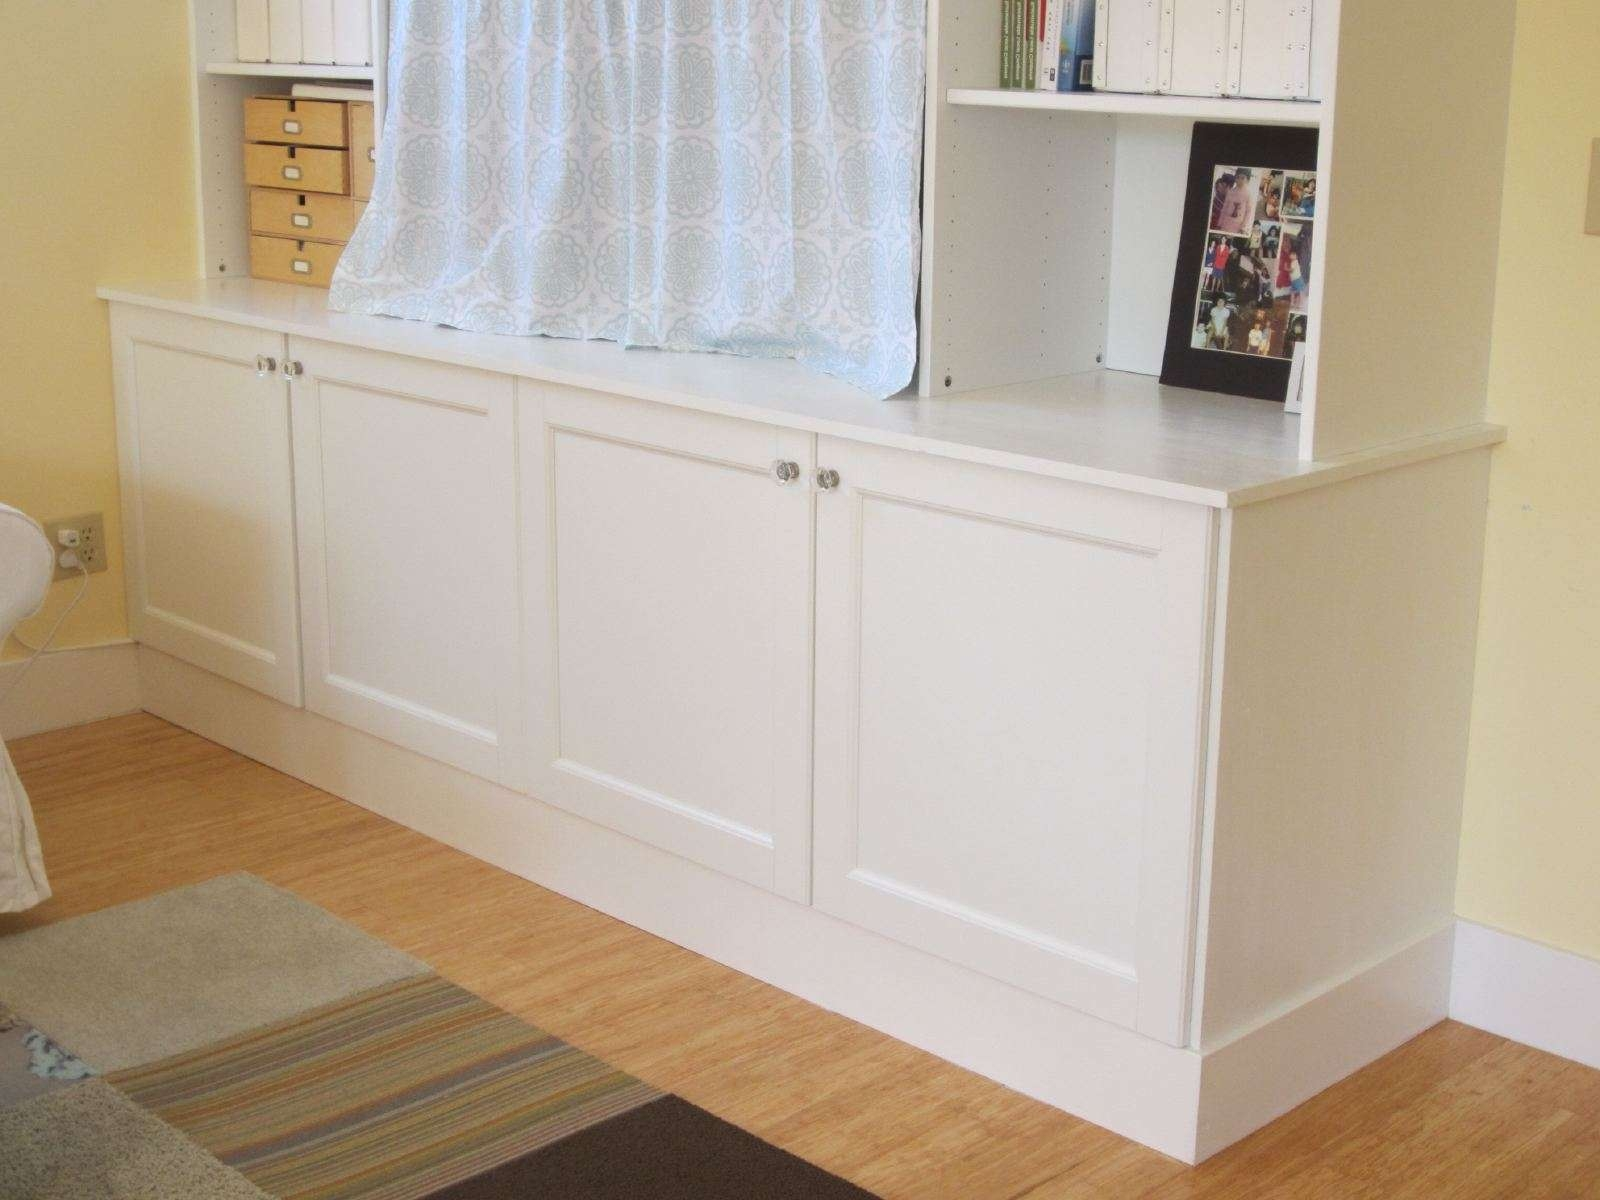 Ikea Hack 2: Besta Built In Family Room Tv Bookshelf – Shirley For Ikea Built In Tv Cabinets (View 7 of 20)